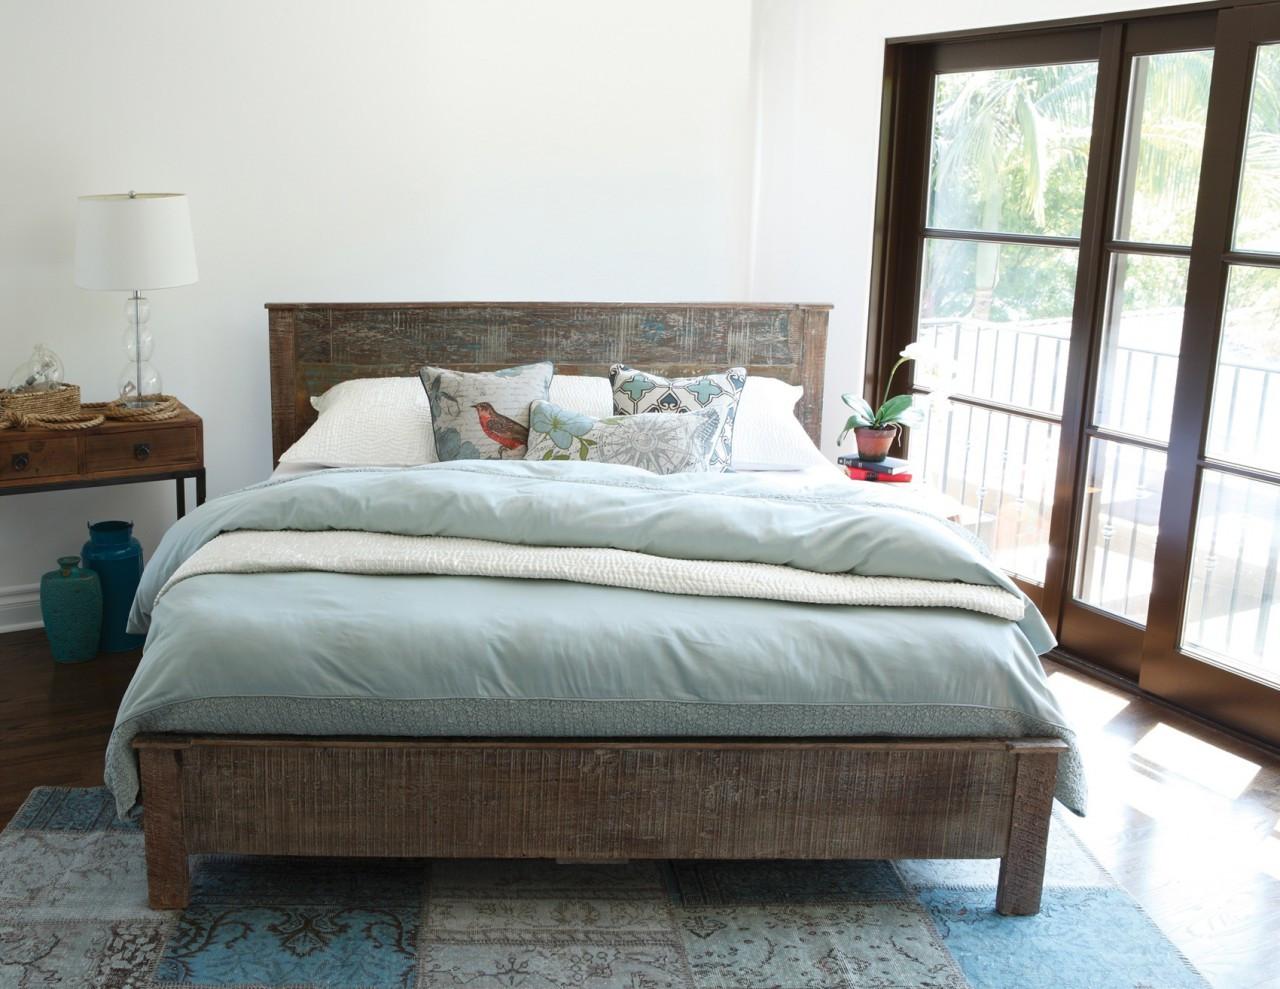 Rustic Wood King Bed Part - 46: Hampton Rustic Teak Wood King Bed Frame